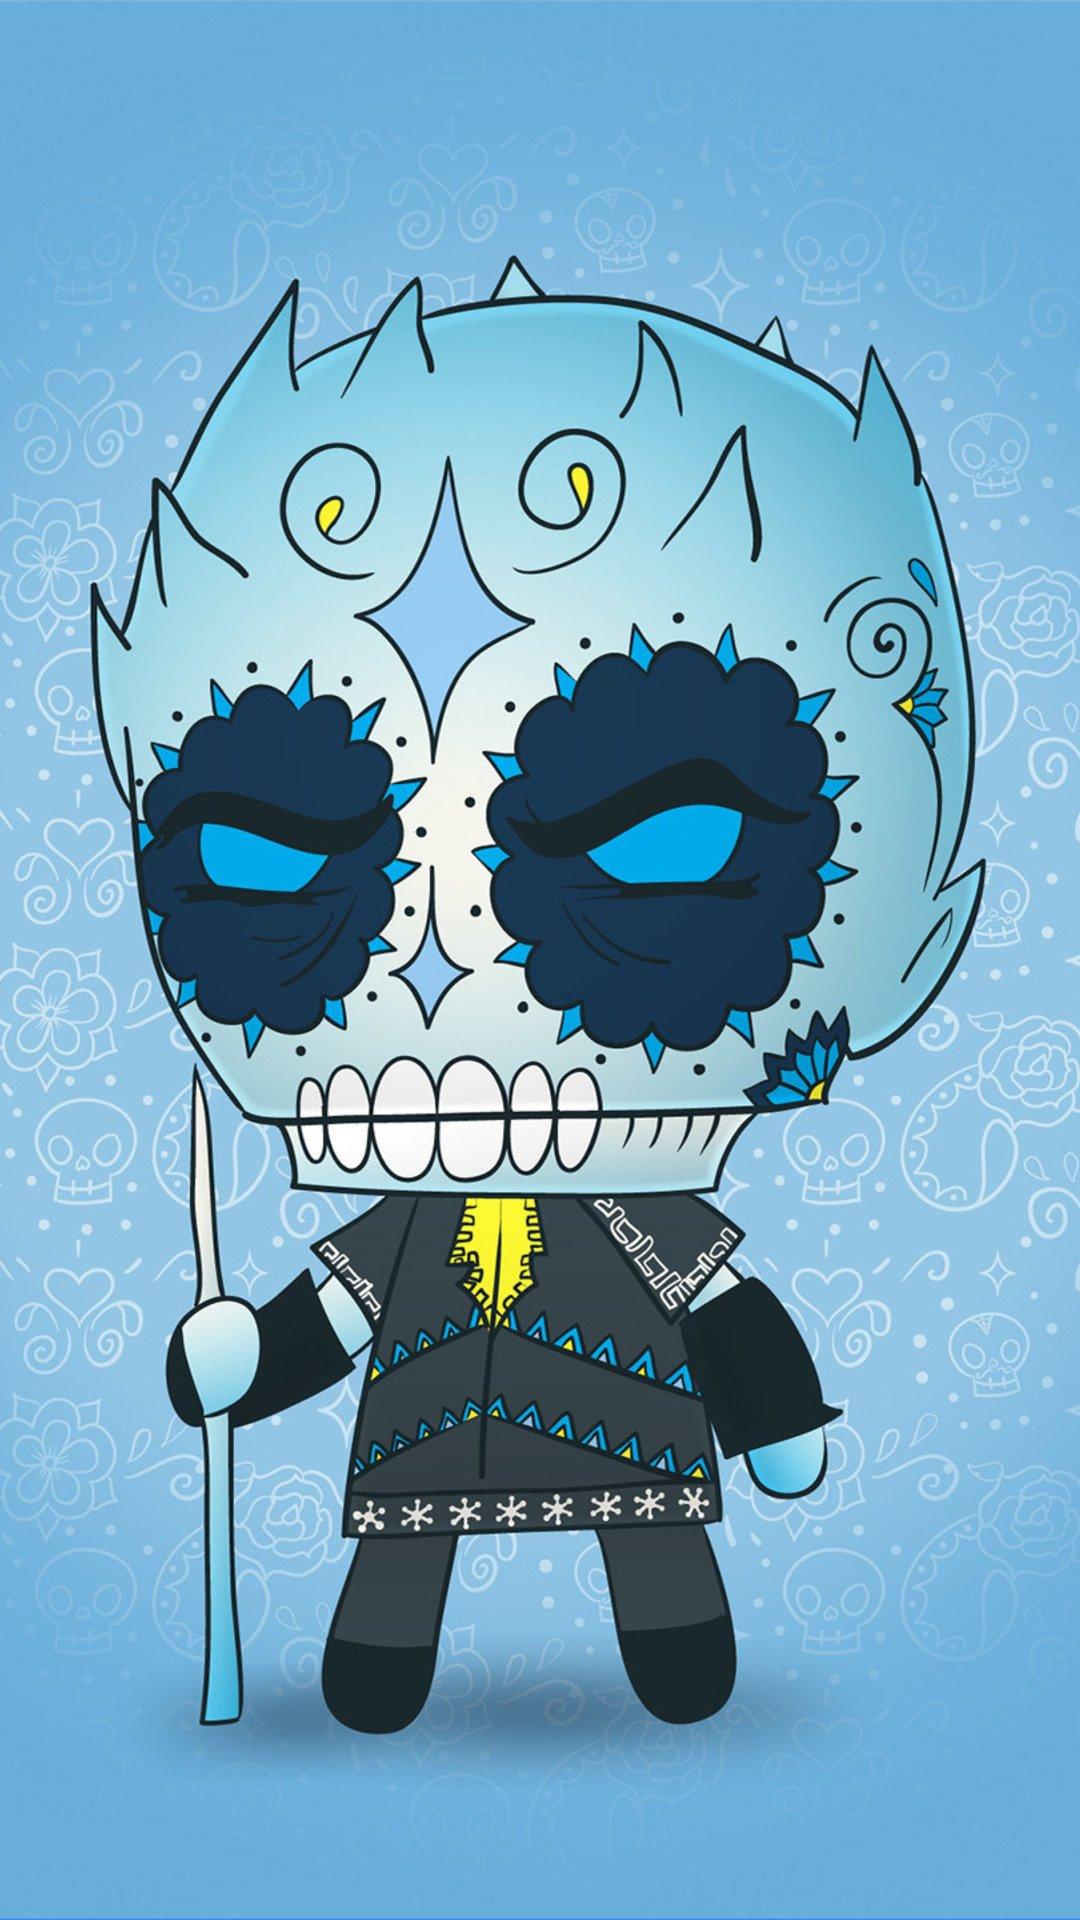 Chibi Zombie, Game Of Thrones